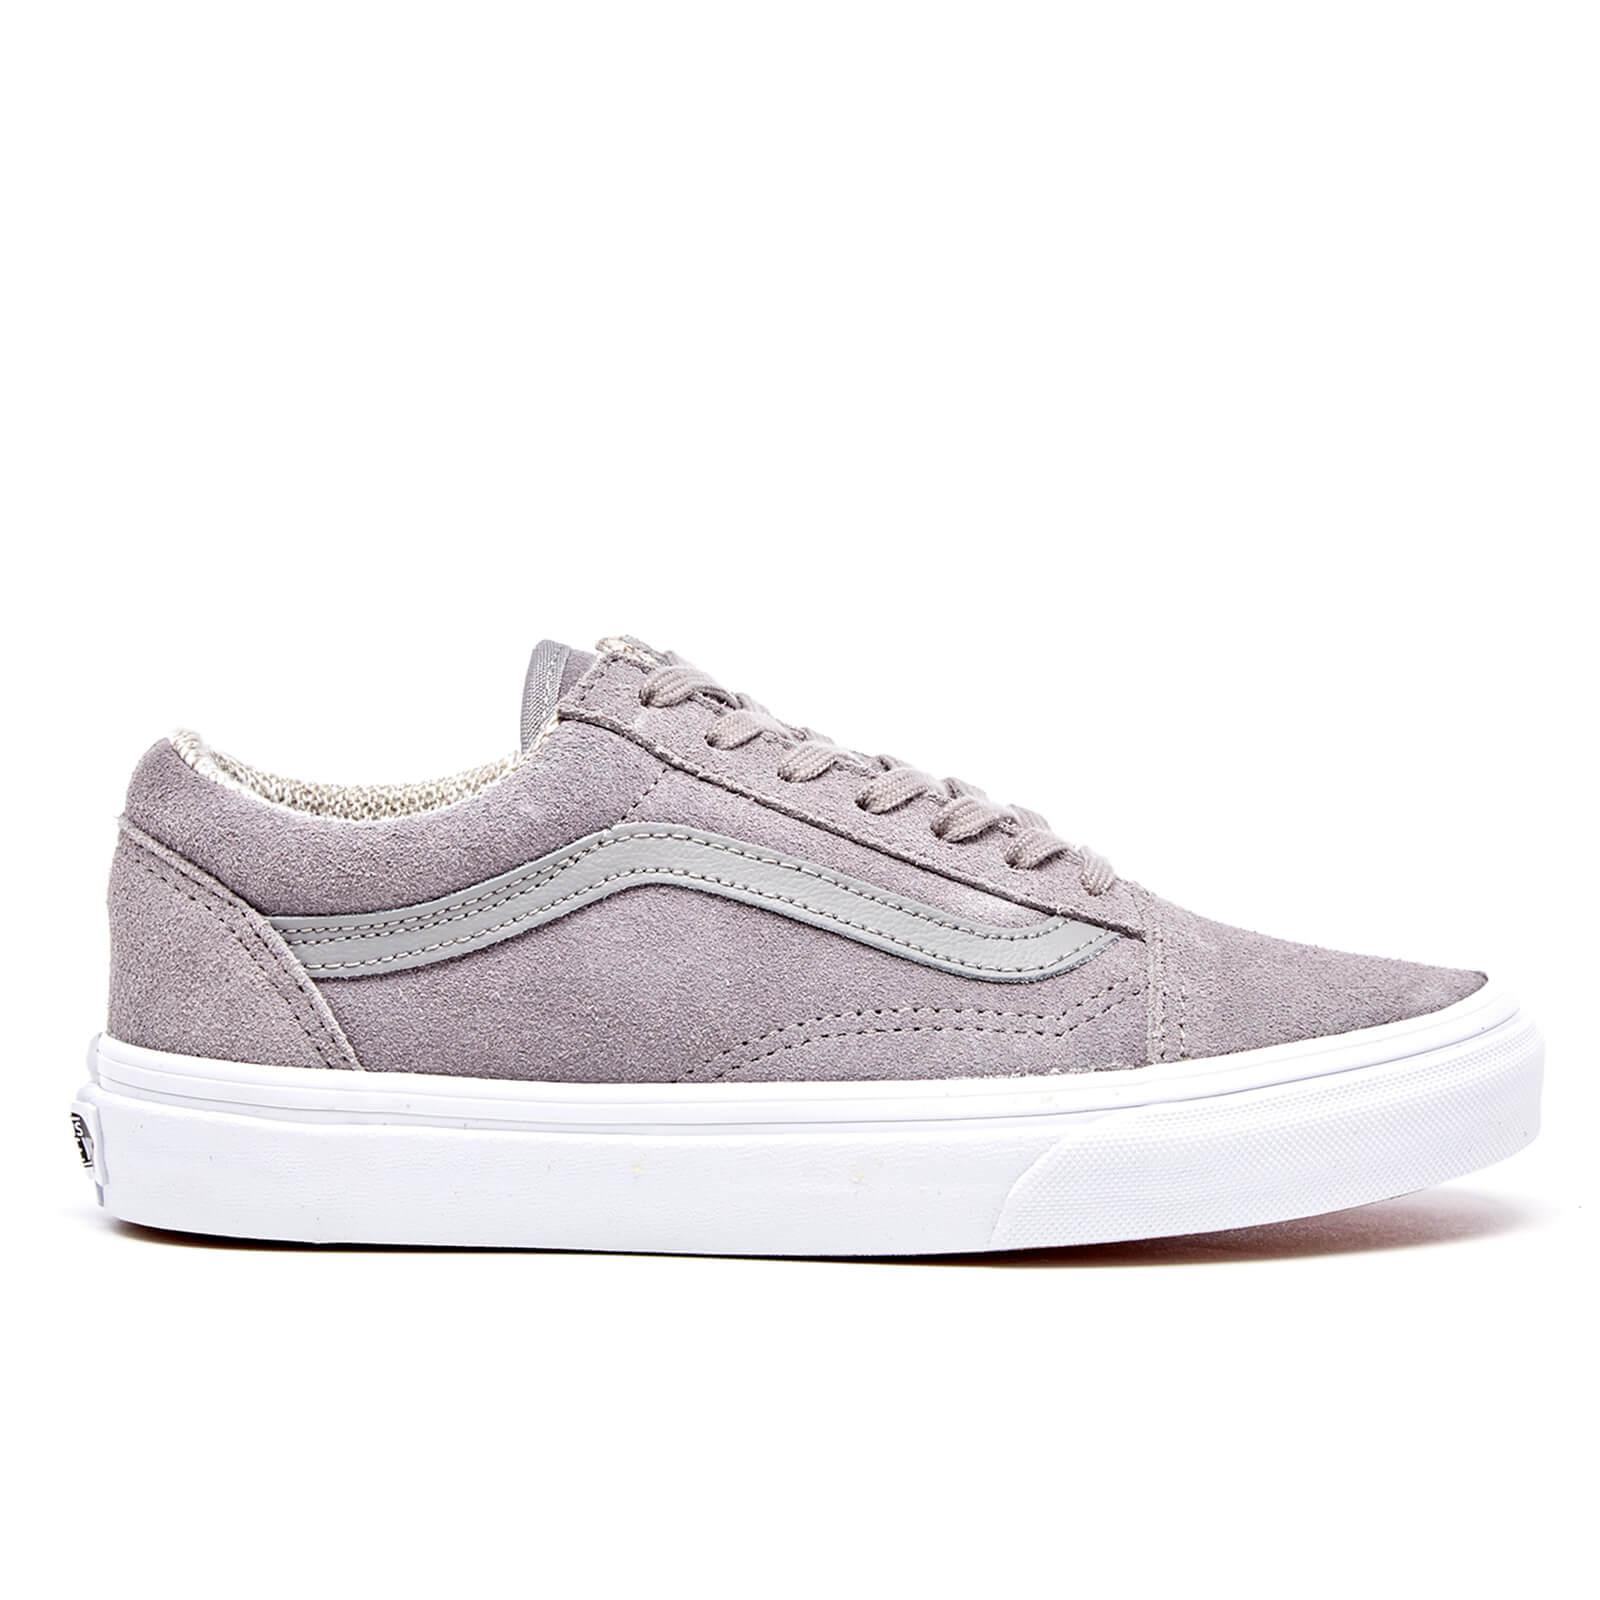 Vans Old Skool Suede Woven graytrue white | Schuhe | Vans